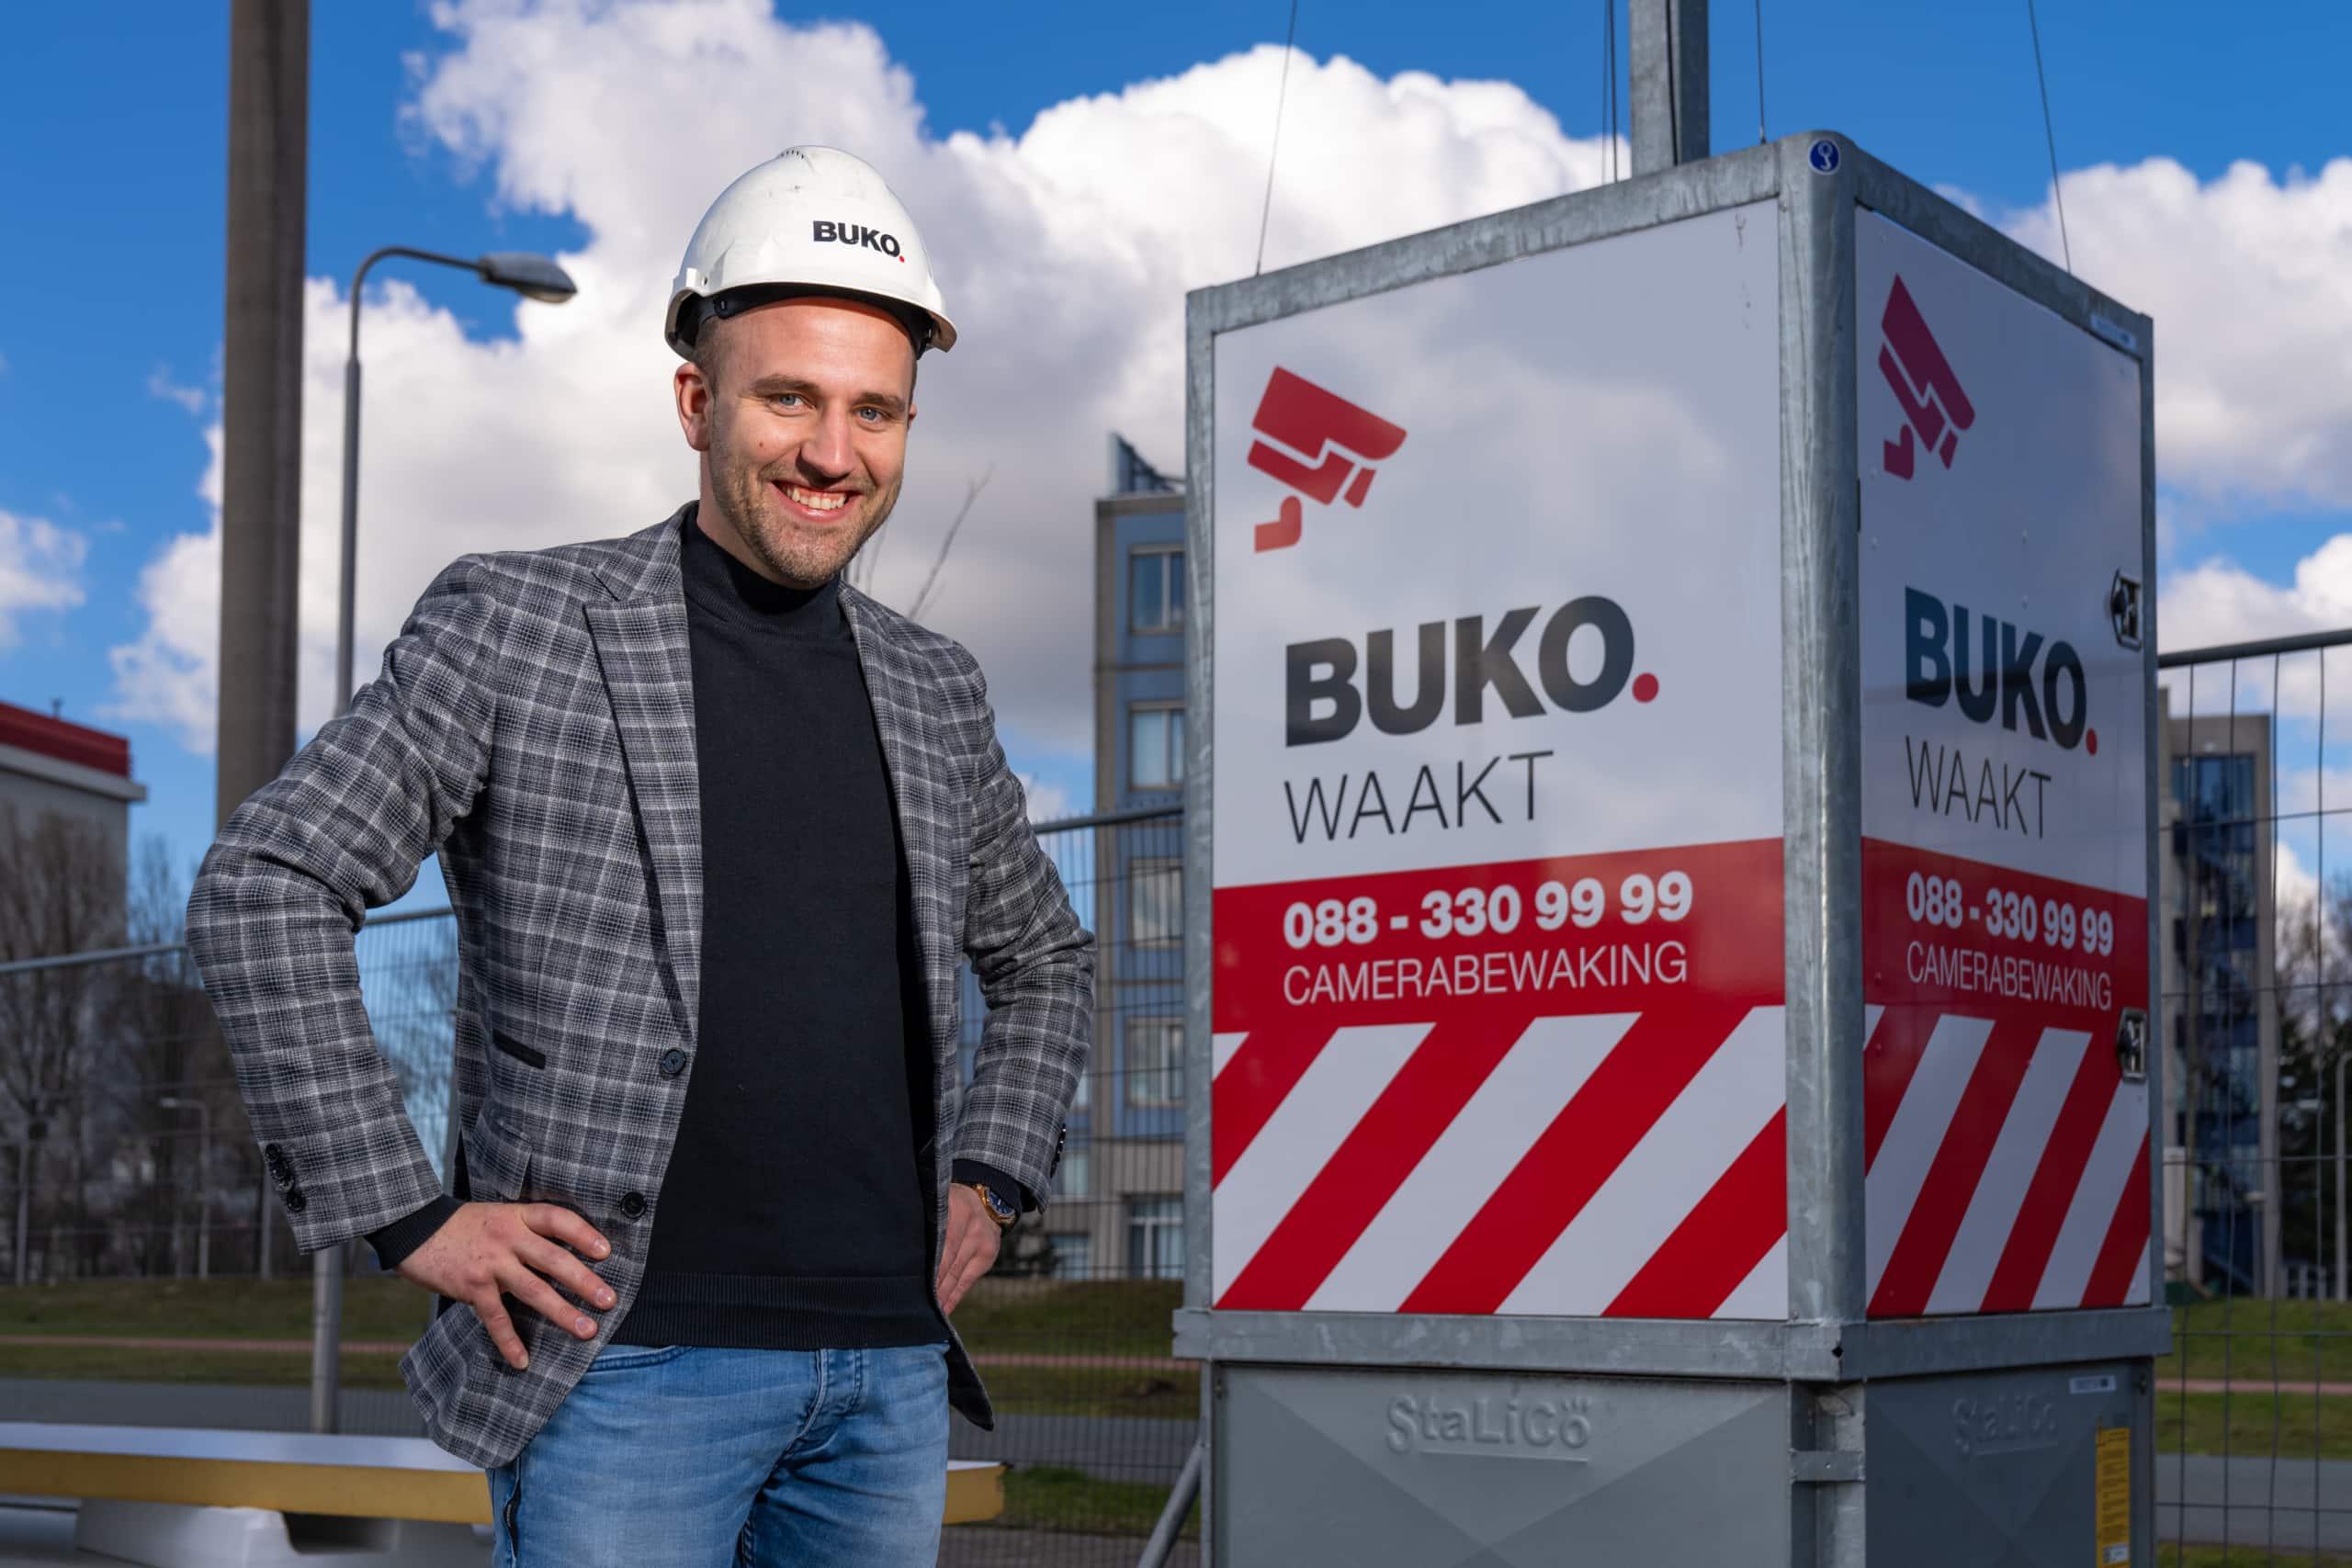 BUKO Waakt